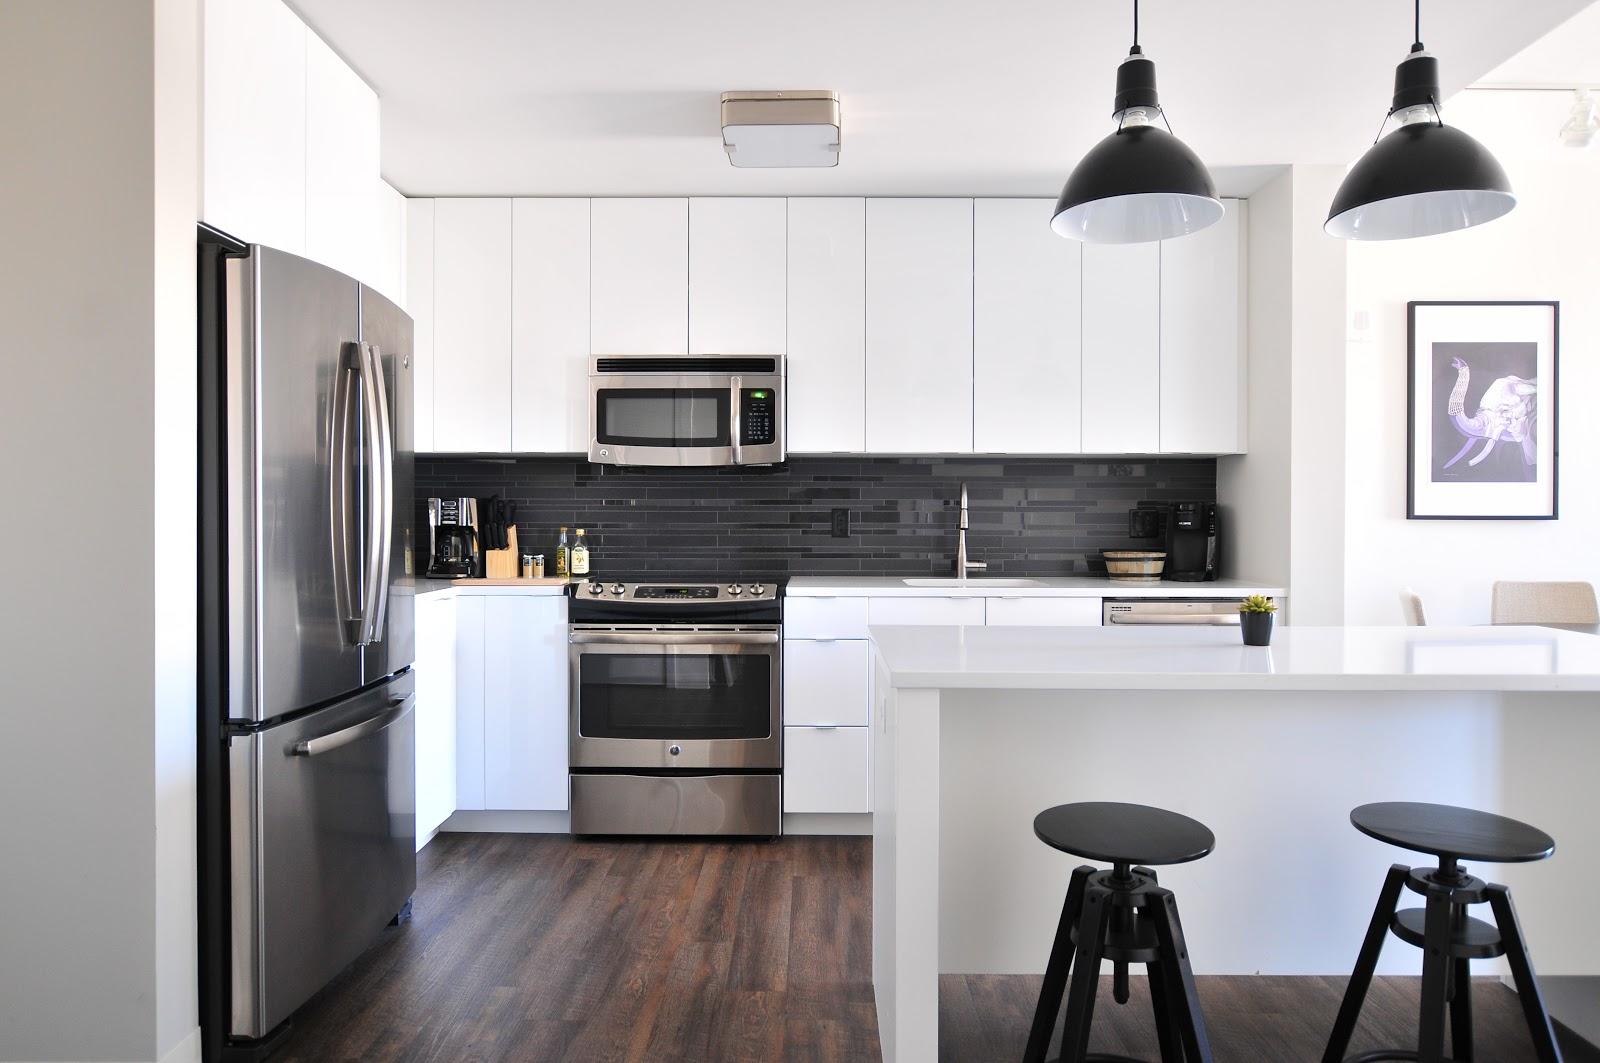 Kitchen in long-term housing in Dallas, Texas